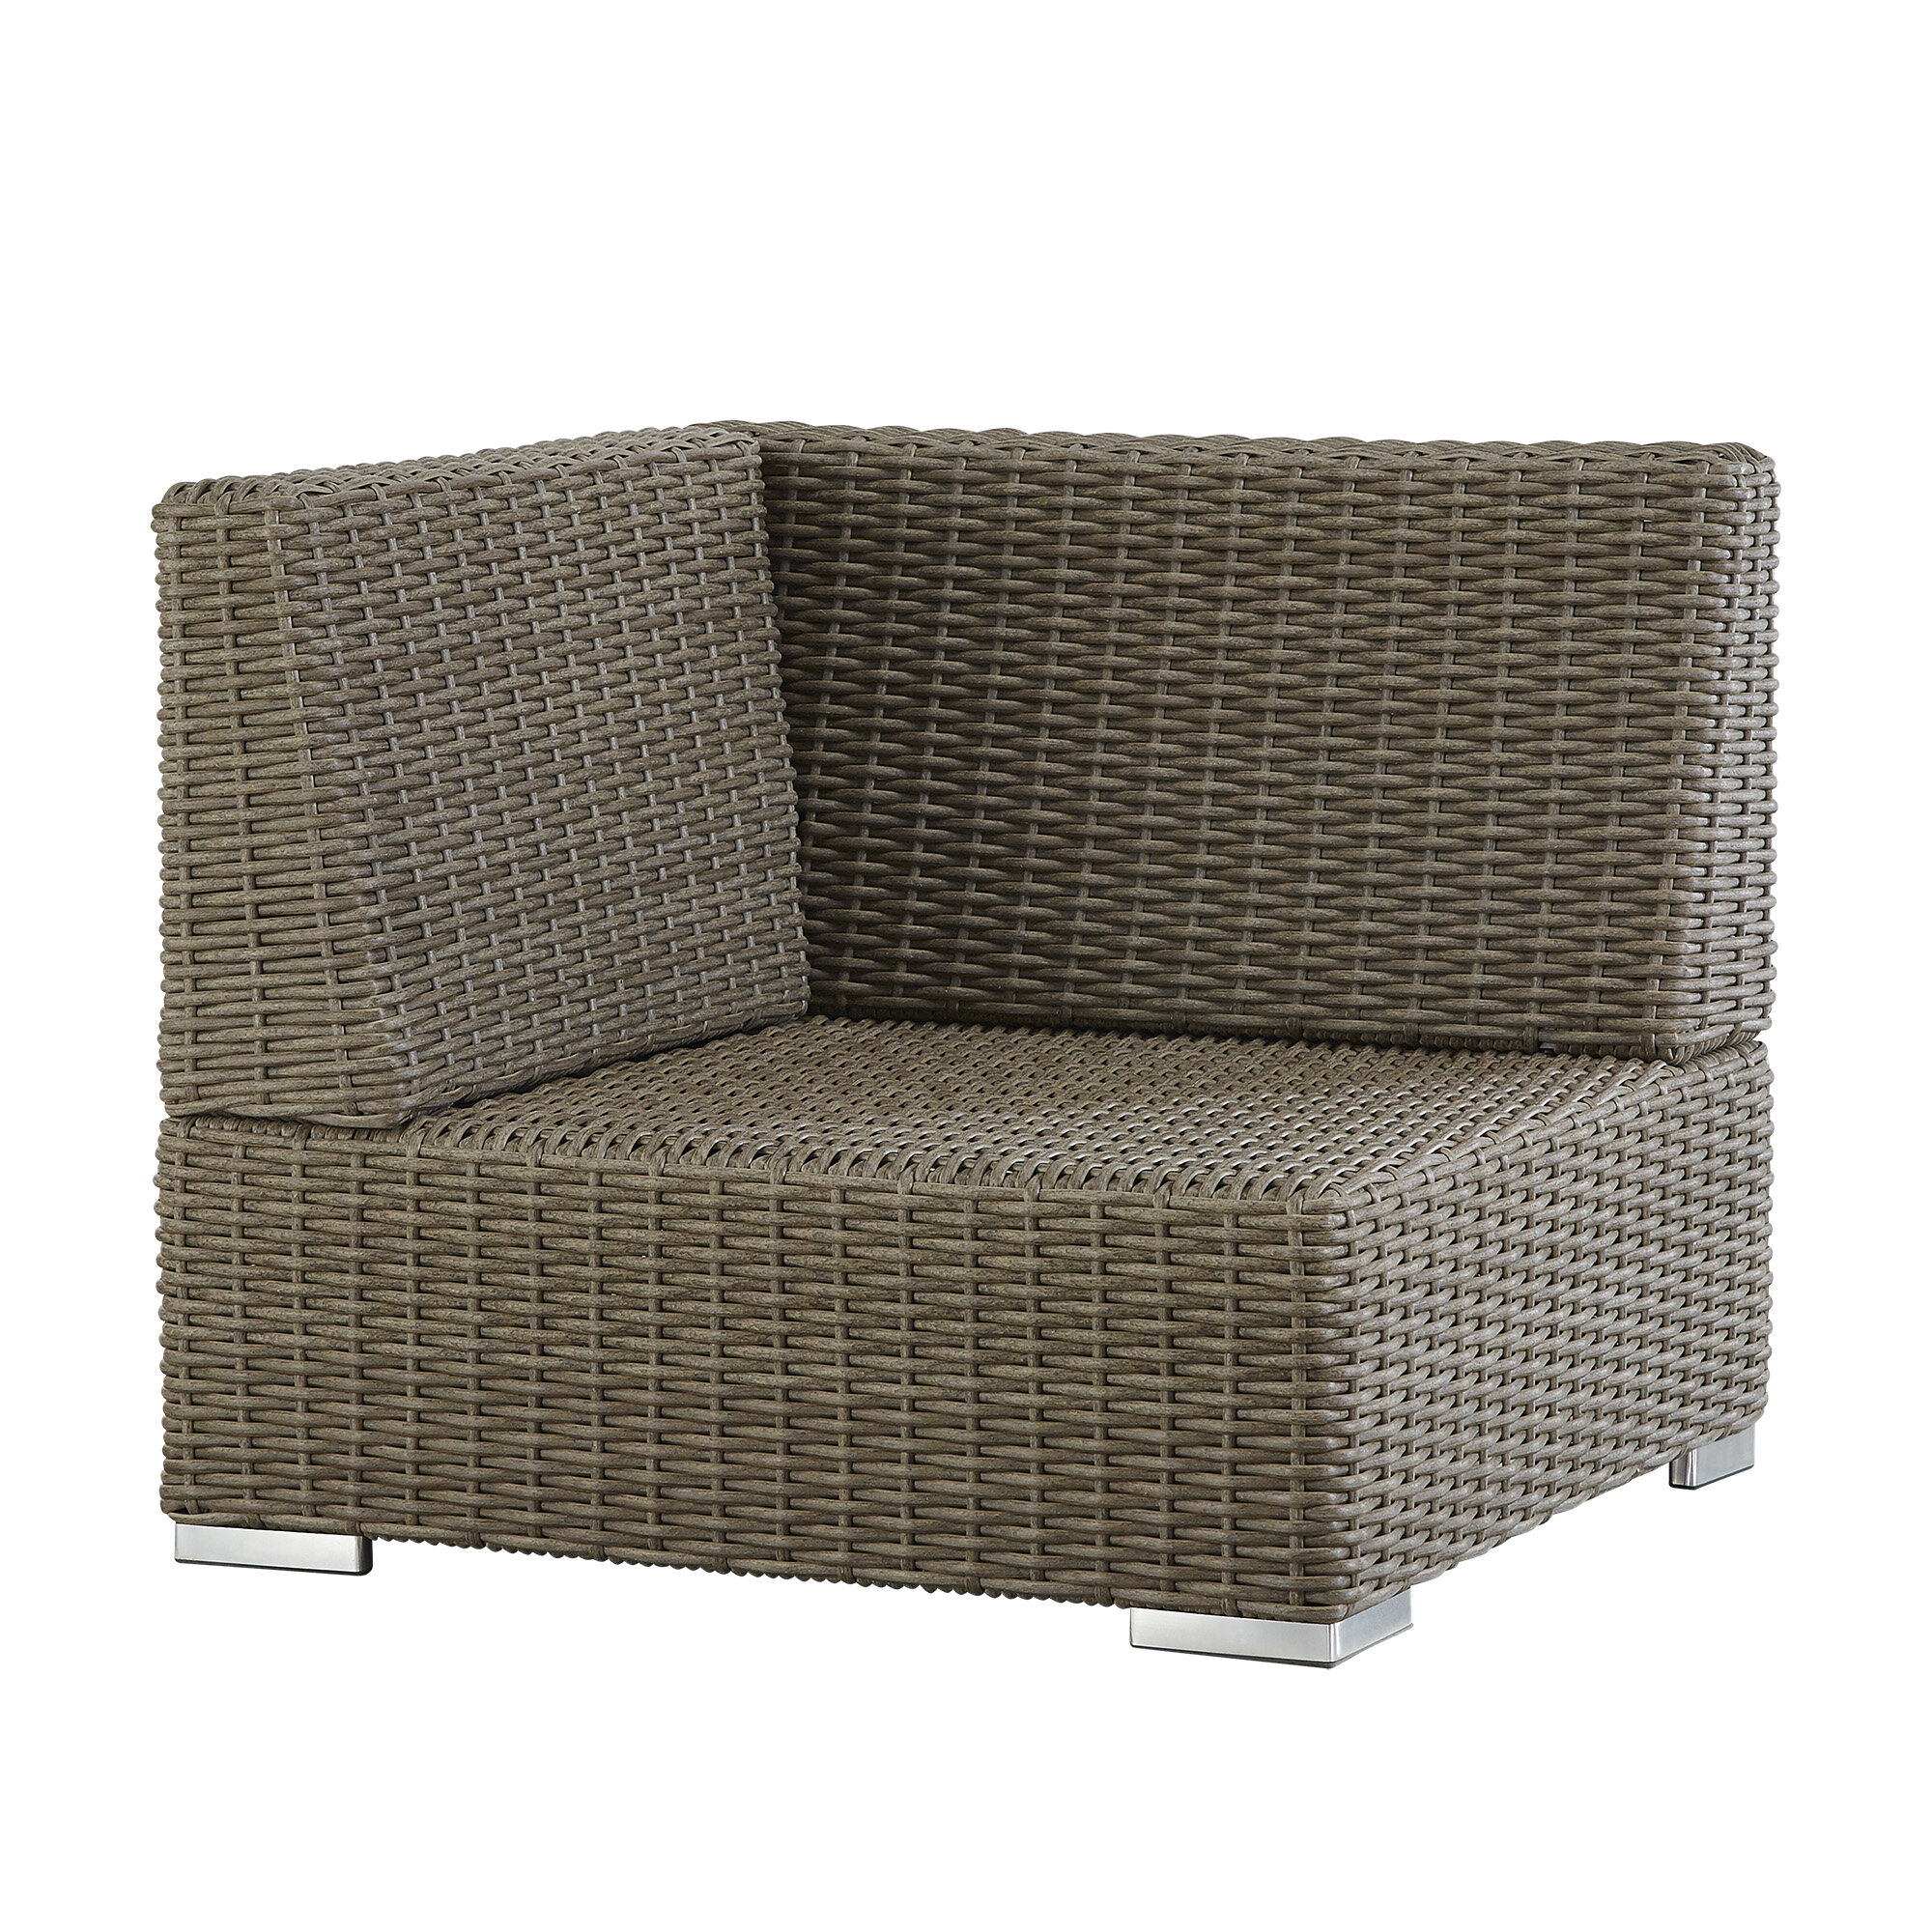 Darby Home Co Rathdowney Wicker Outdoor Sectional Corner Chair | Wayfair